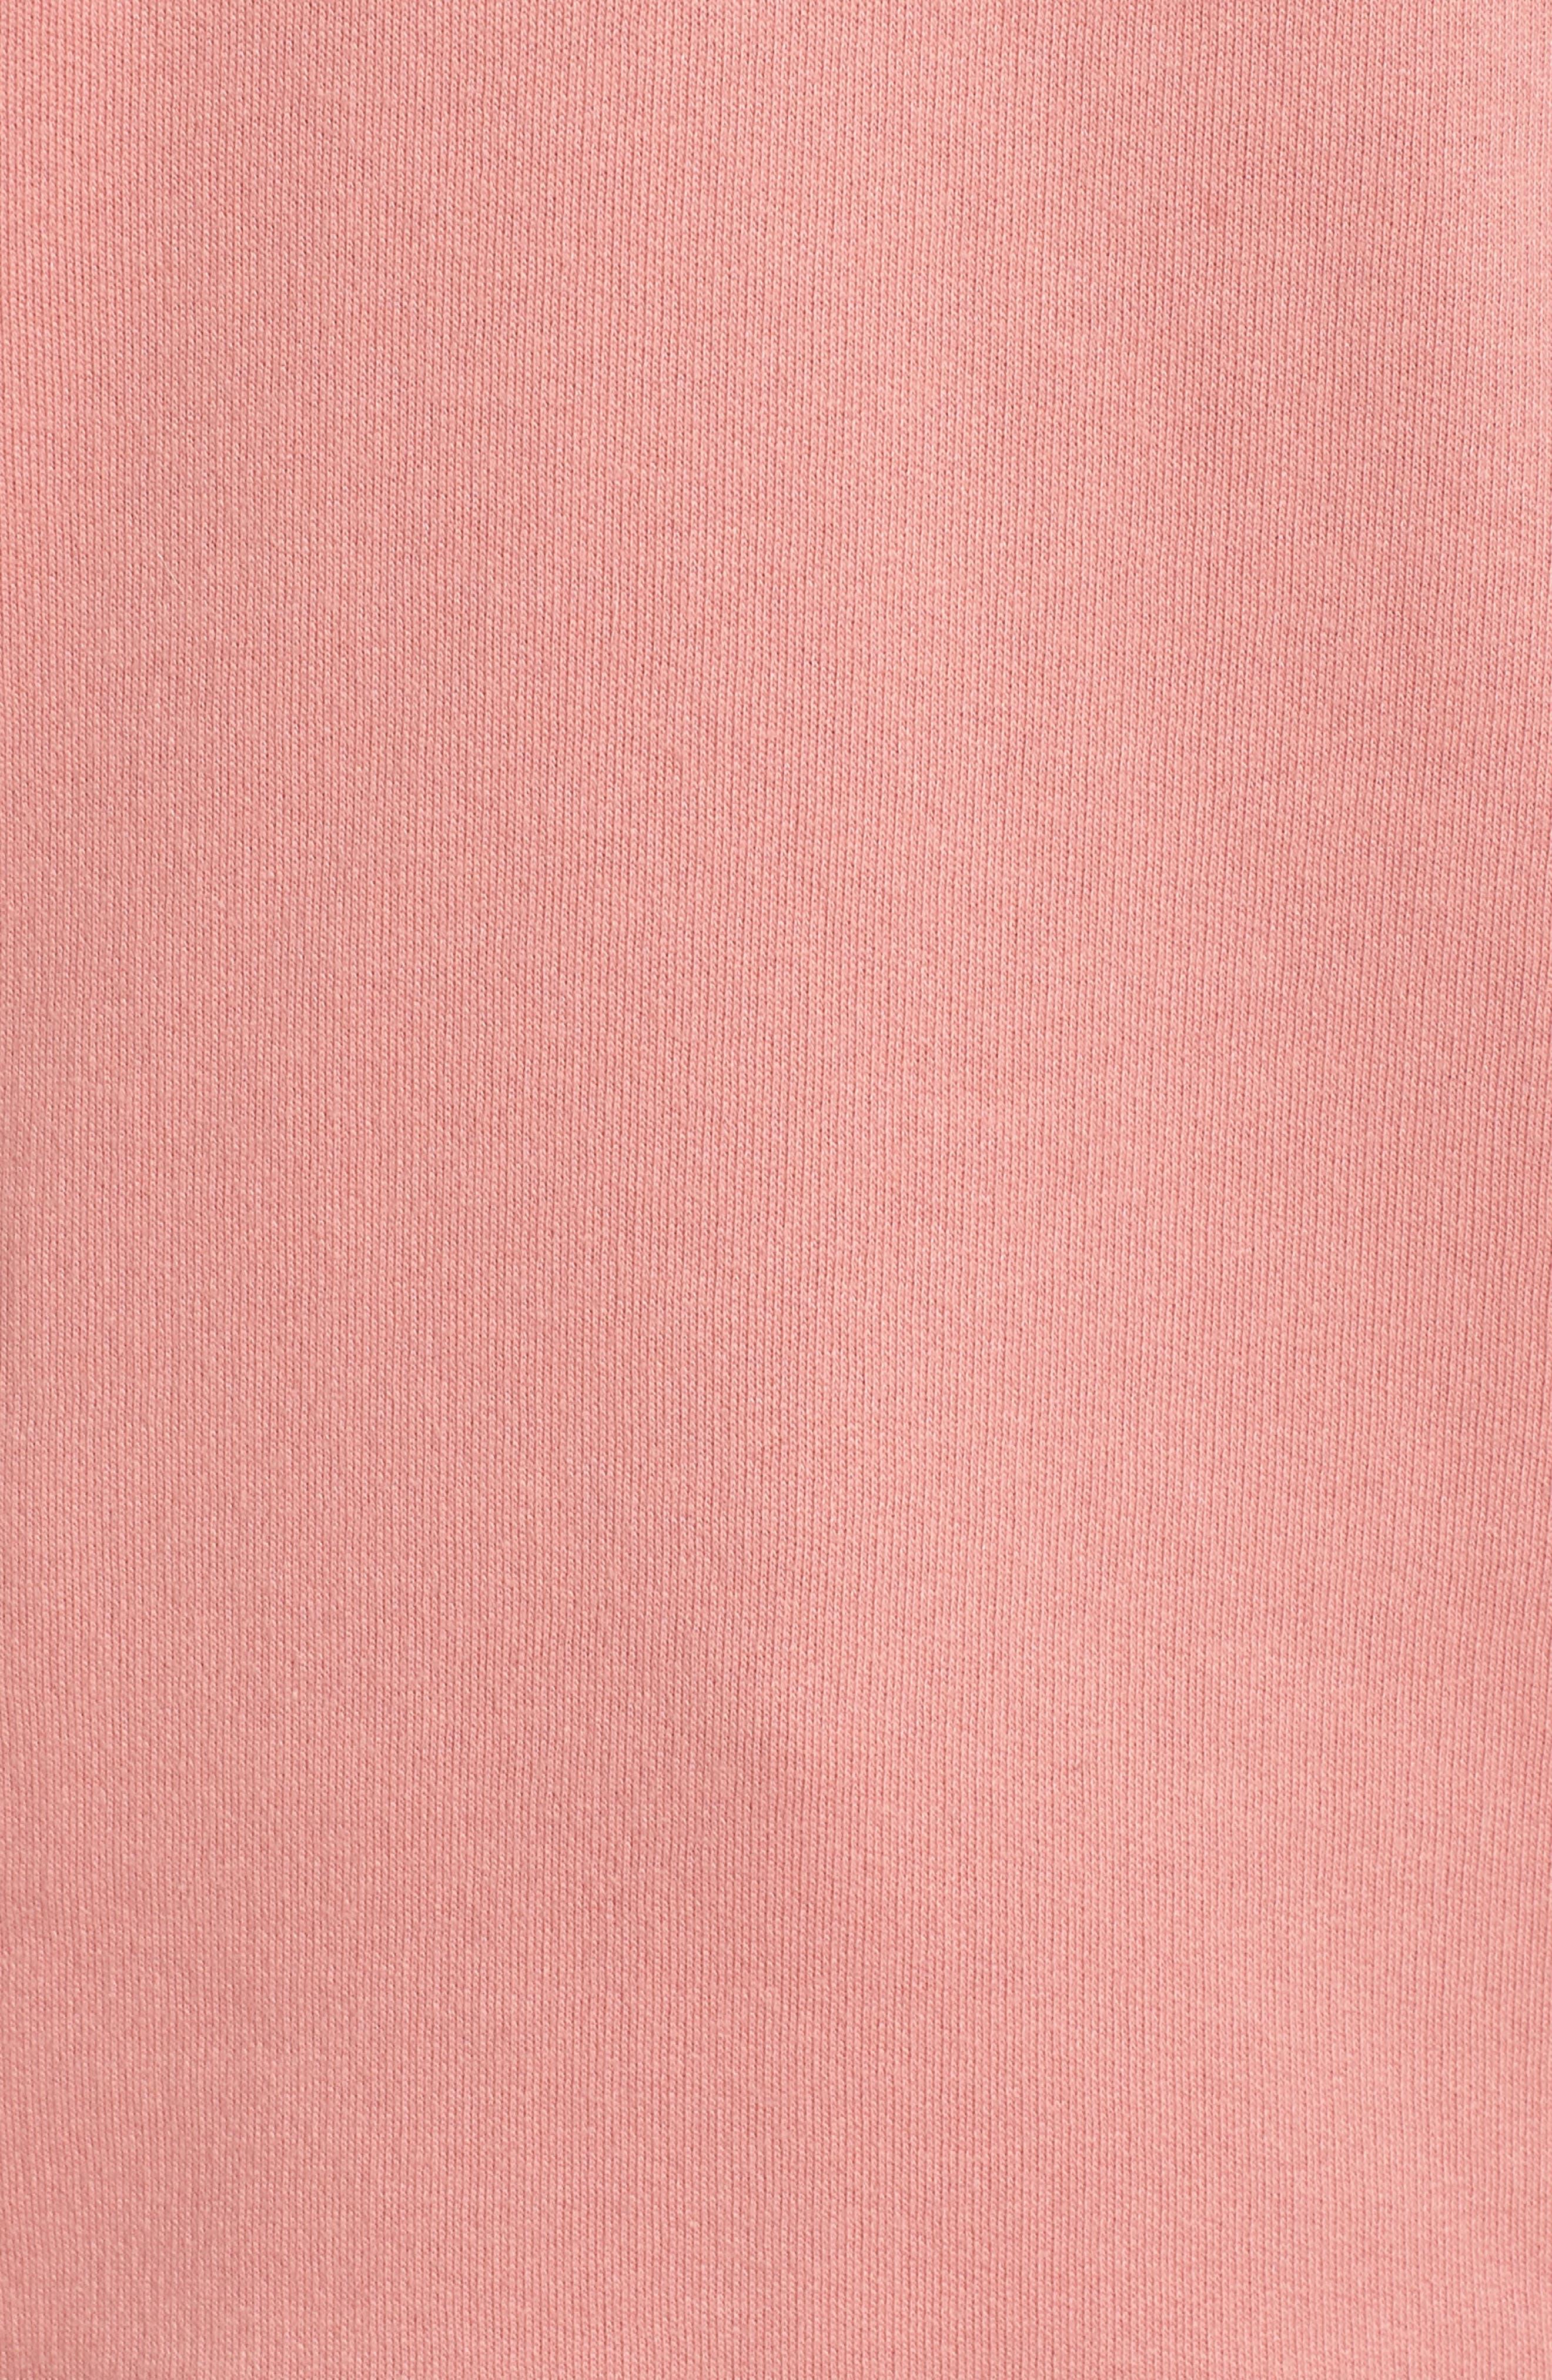 Babes Who Brunch Sweatshirt,                             Alternate thumbnail 5, color,                             955